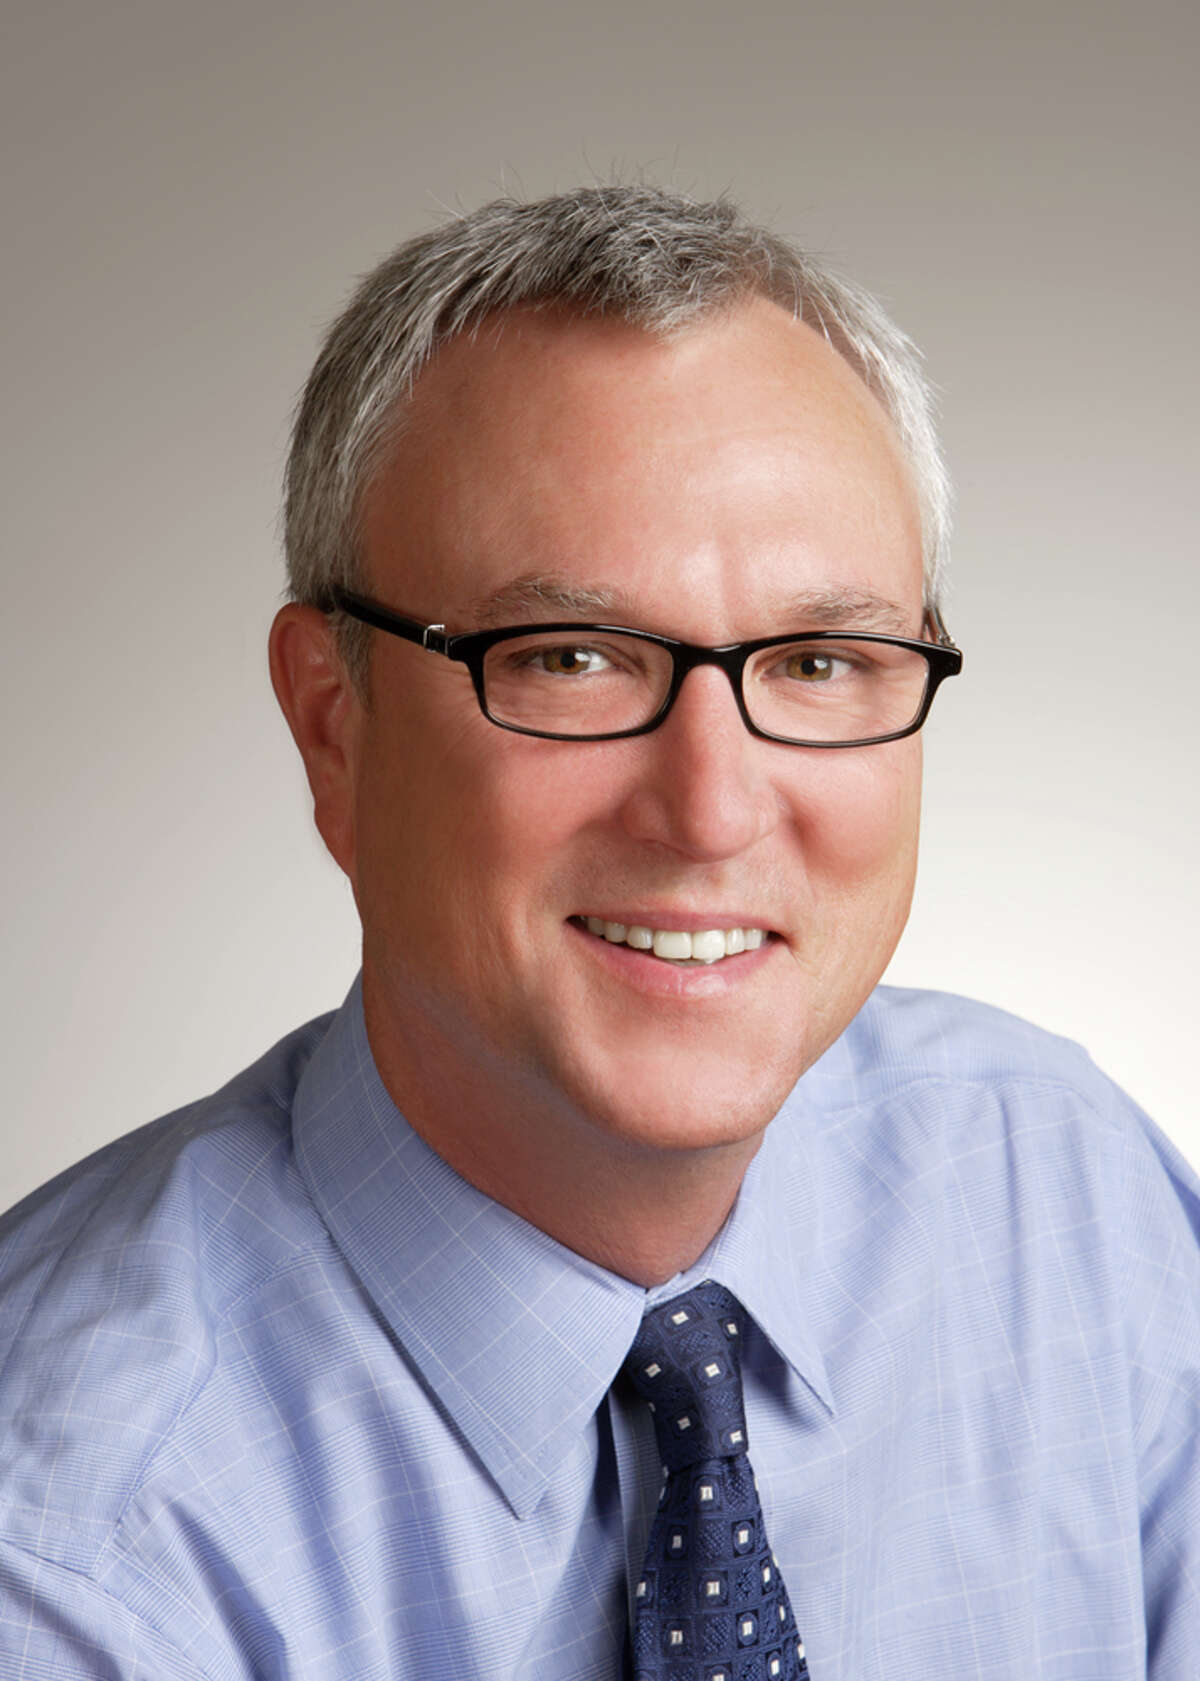 Chris Bell of Berg Feldman Johnson Bell, a litigation boutique.